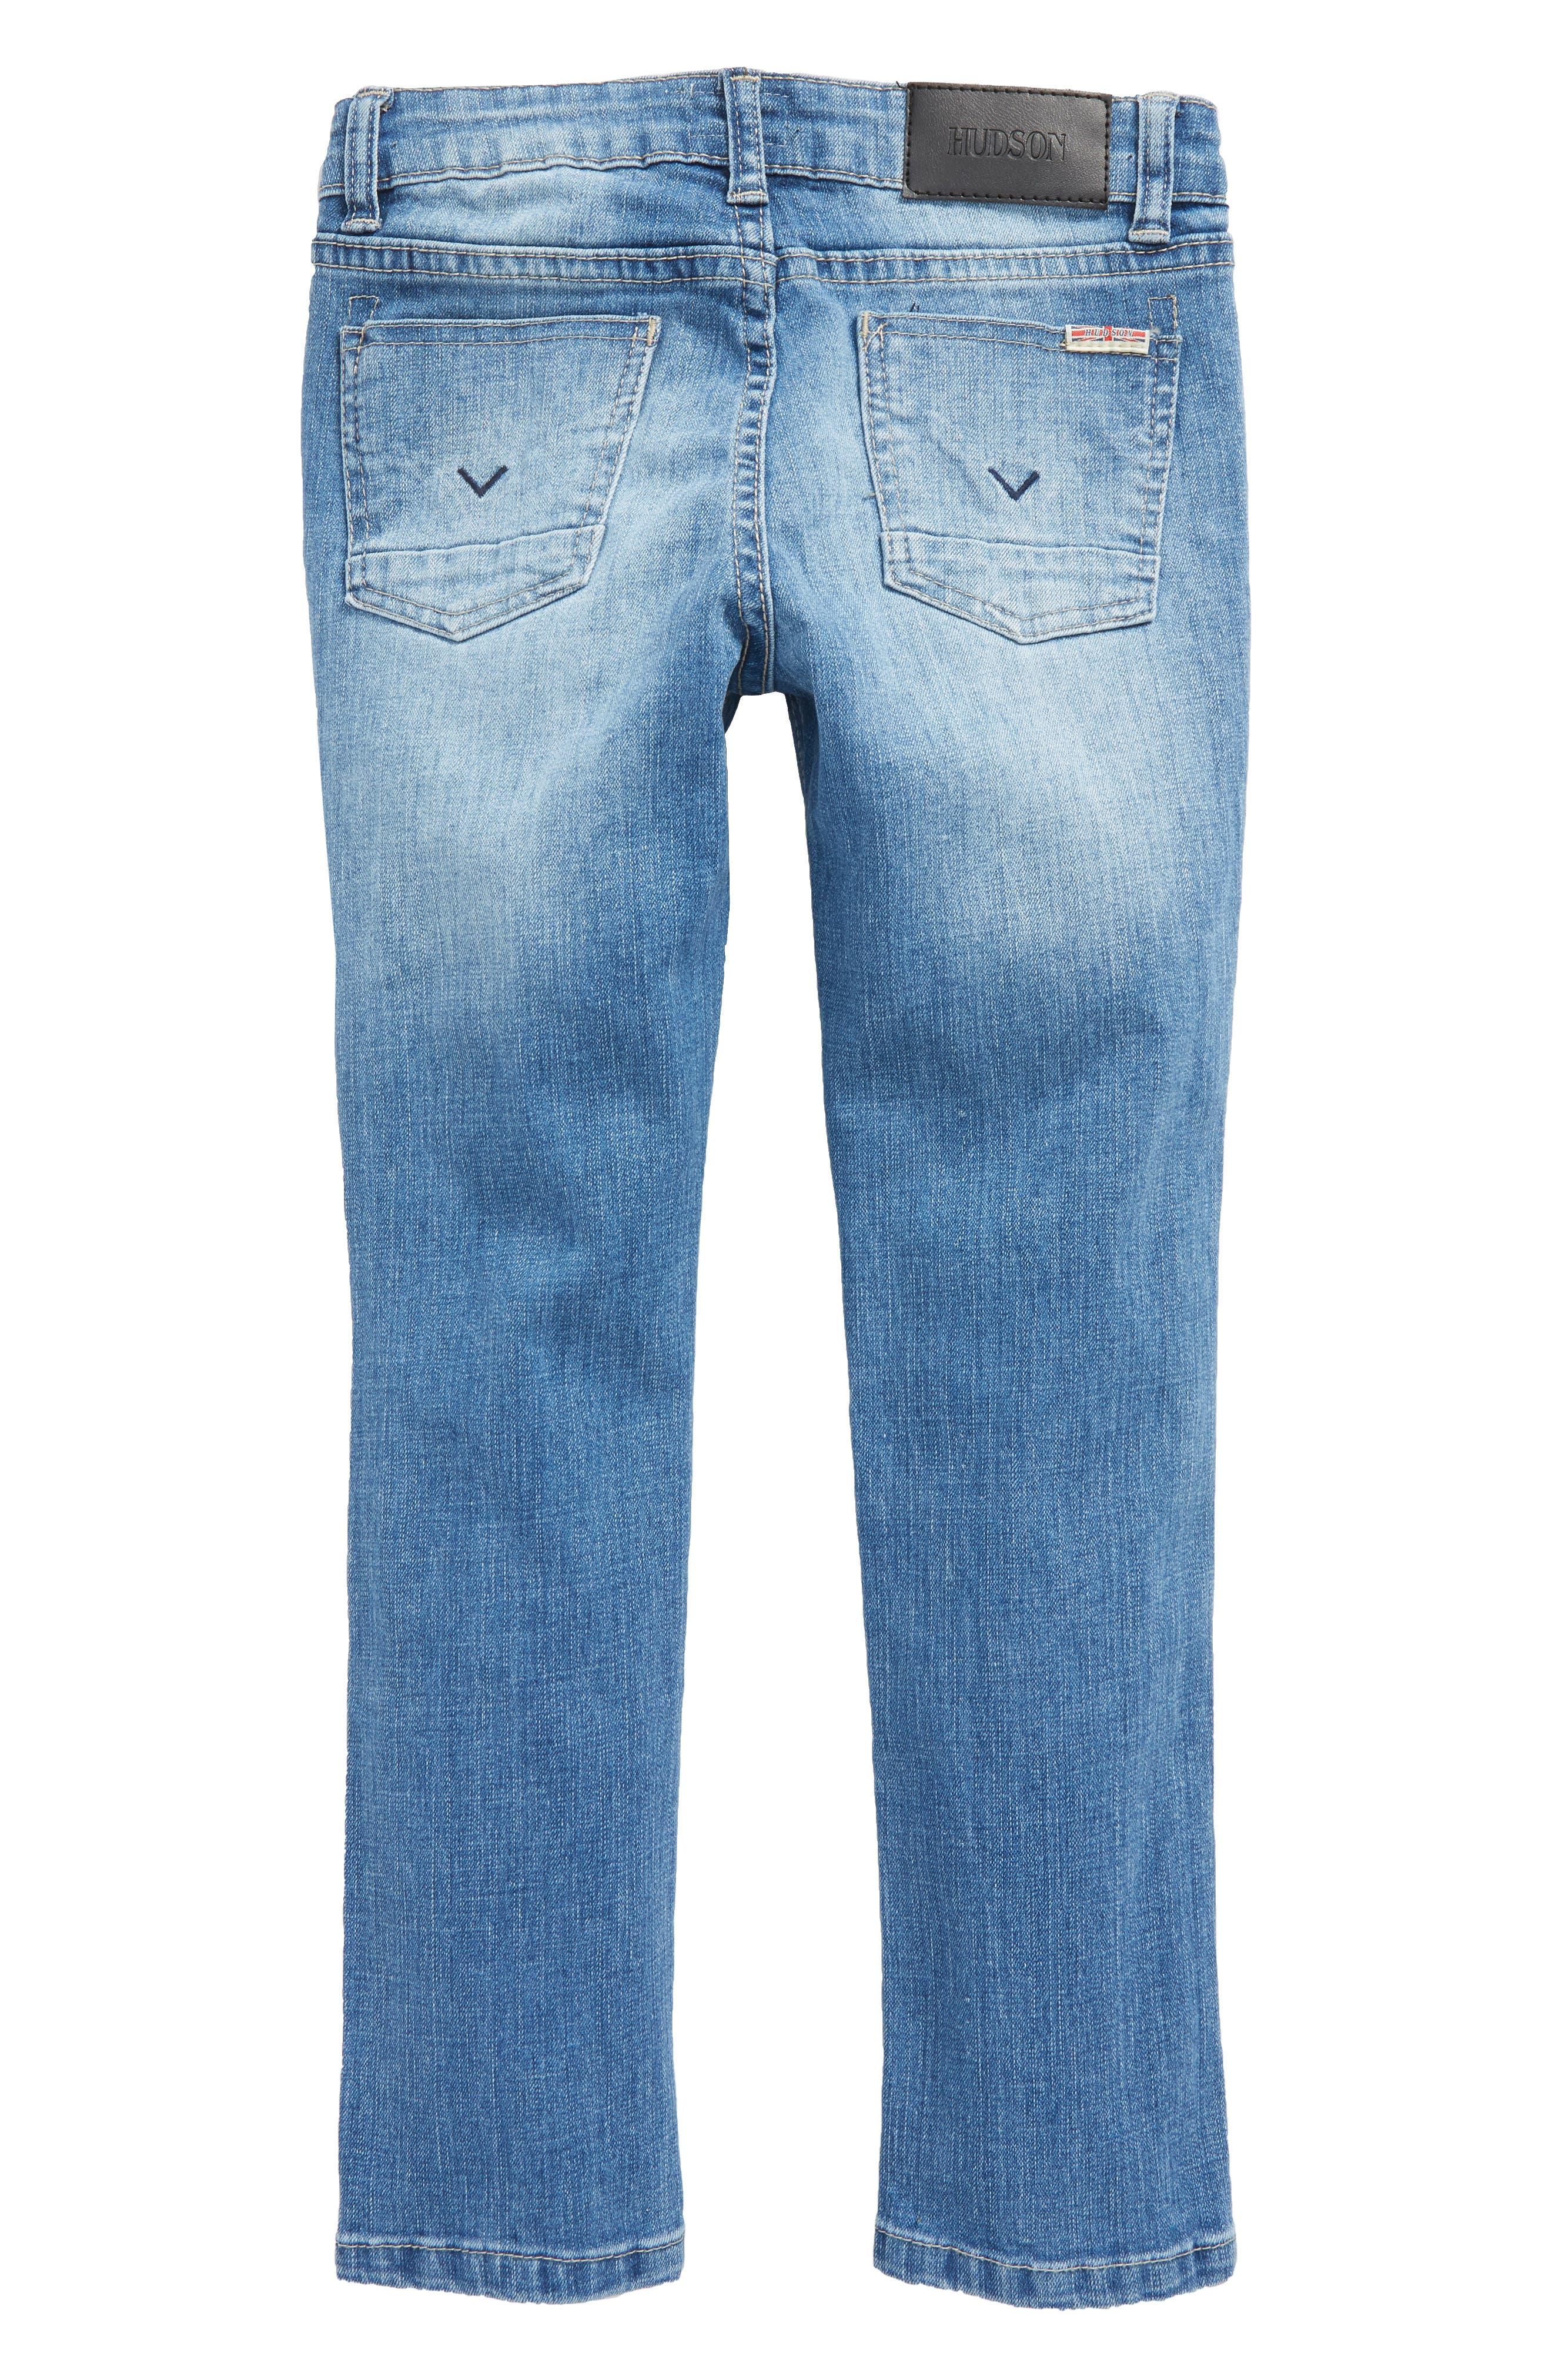 Jude Skinny Jeans,                             Alternate thumbnail 2, color,                             Stone Wash